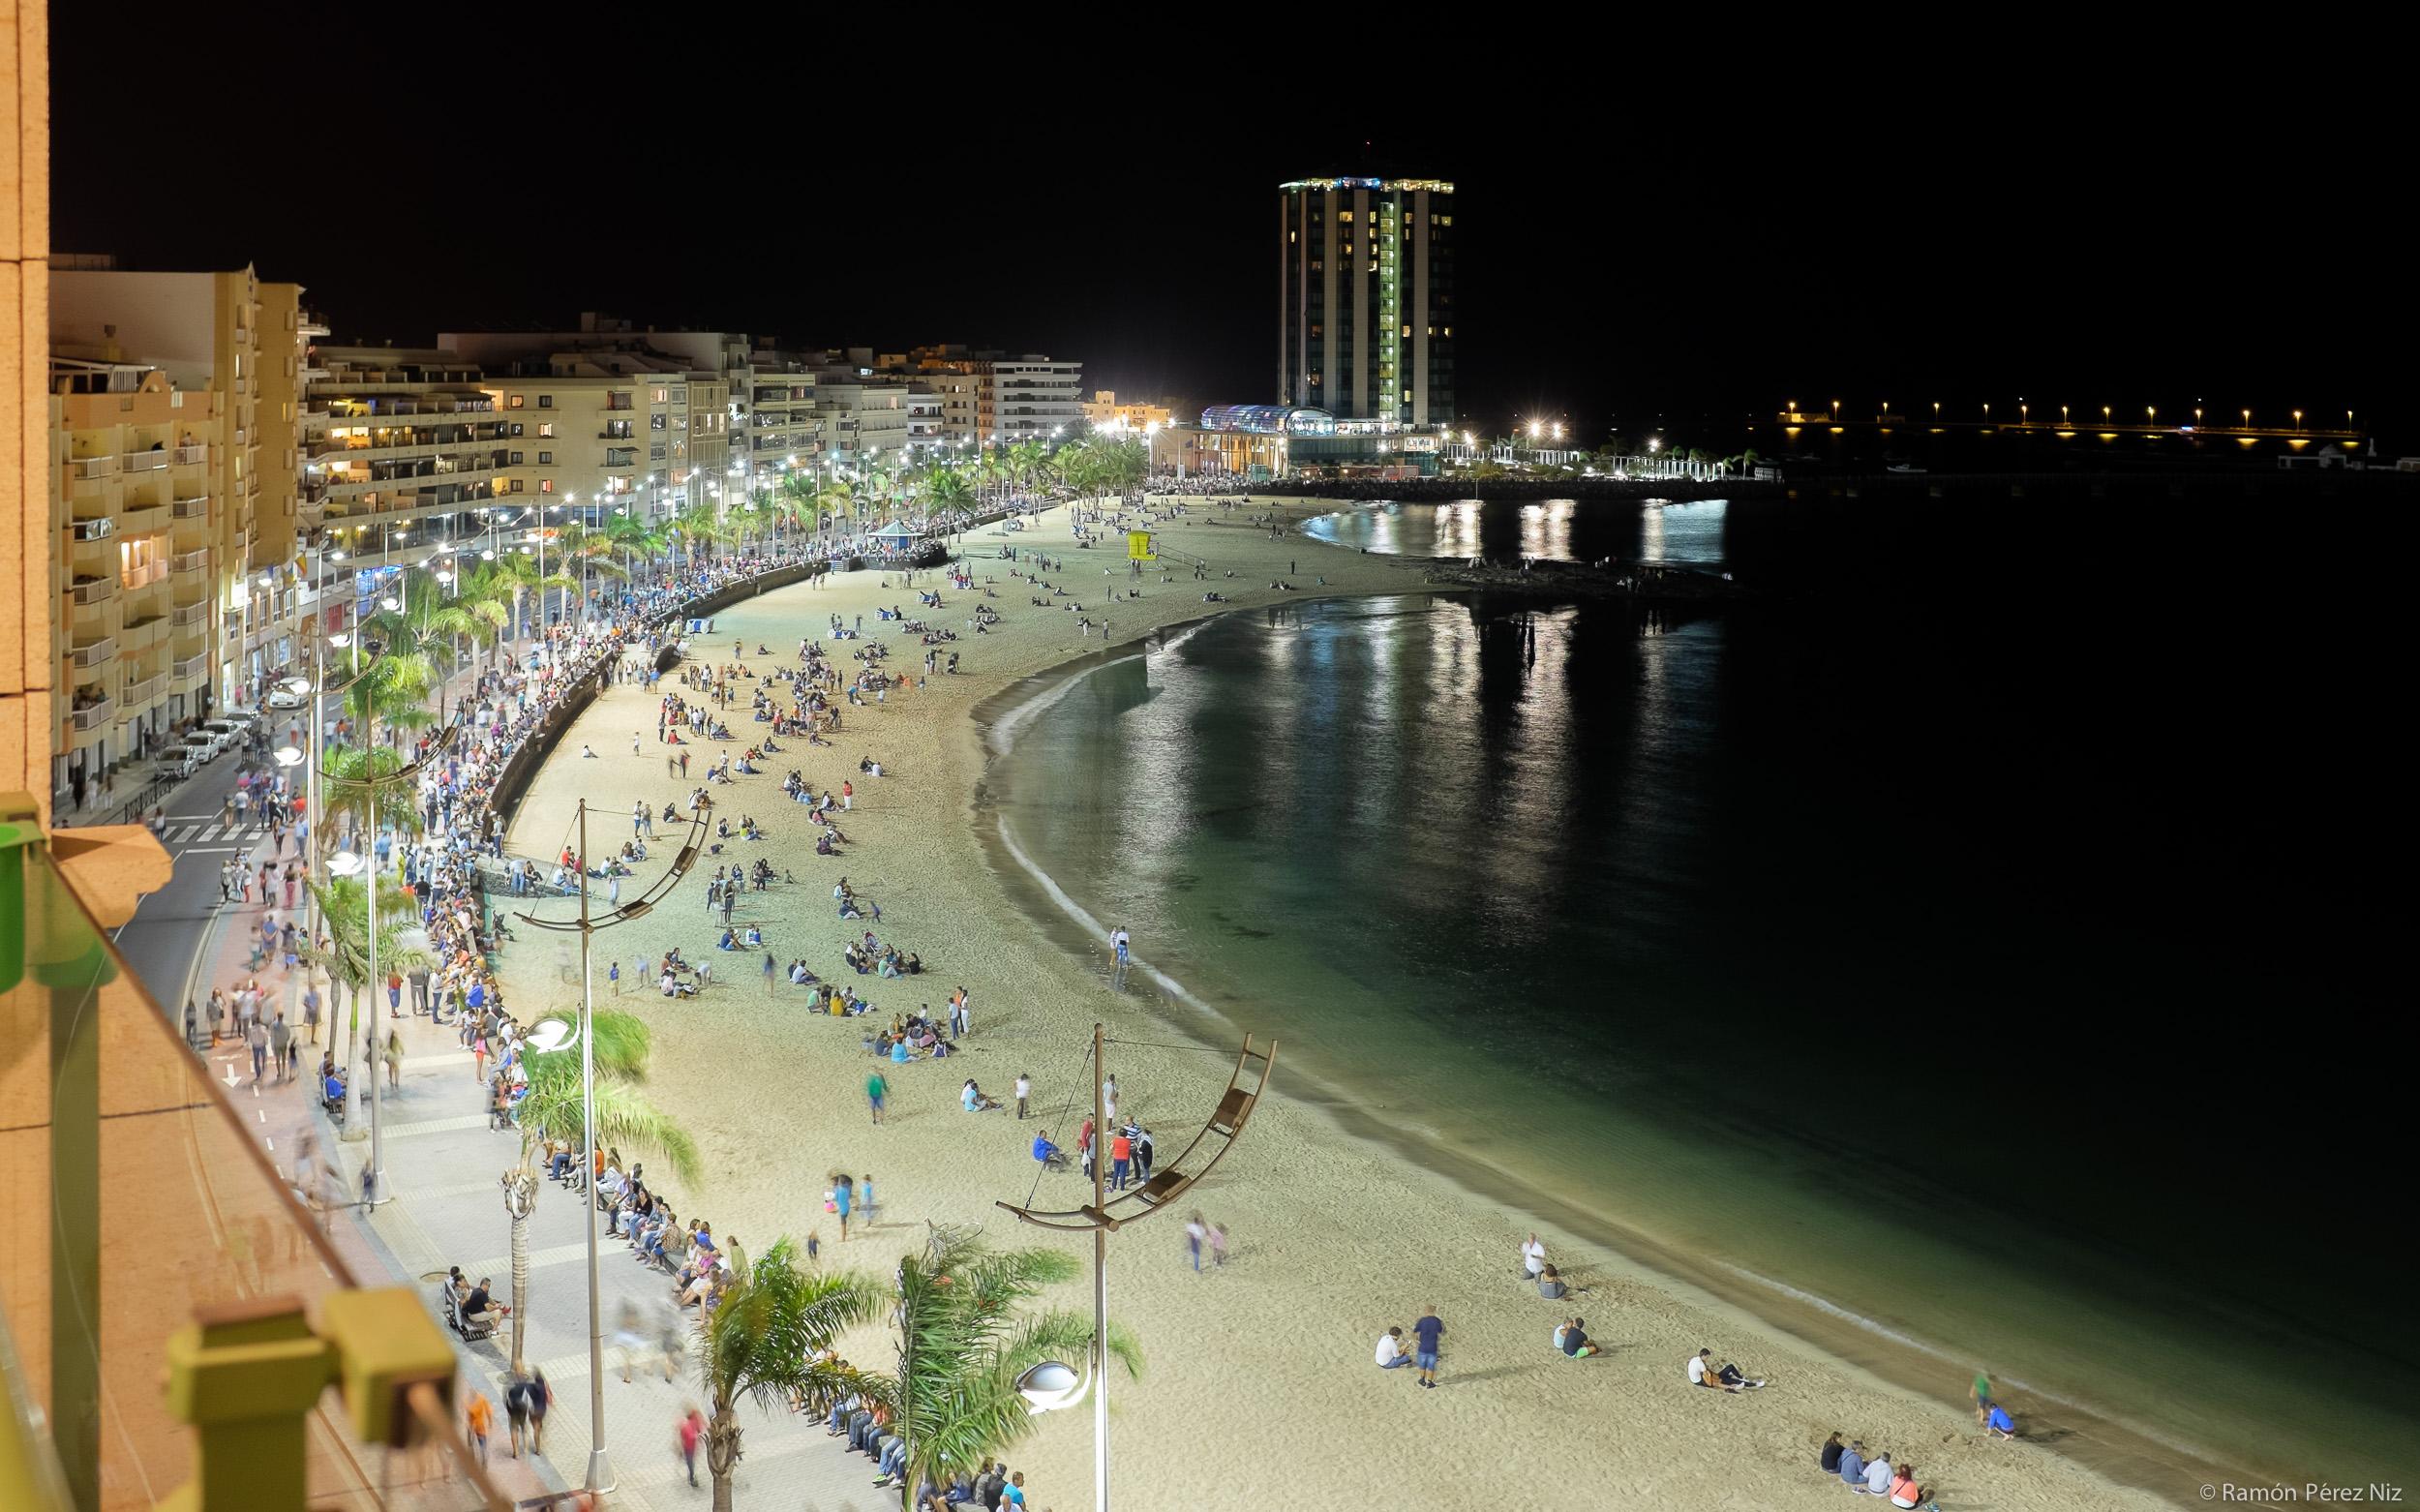 Foto de Ramón Pérez Niz, playa del reducto